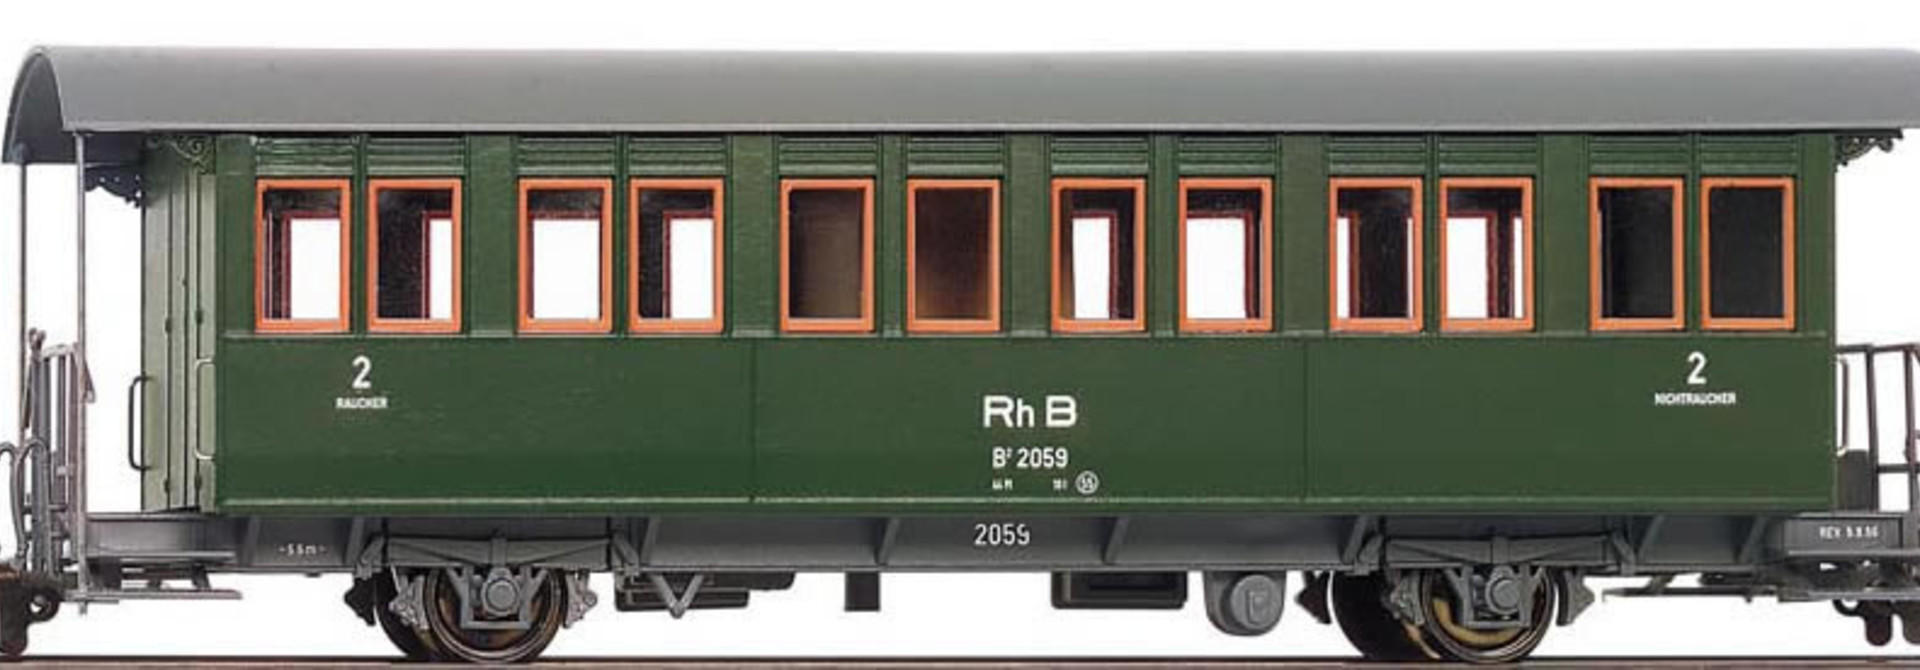 3230120 RhB B 2068 Zweiachser 60er Jahre